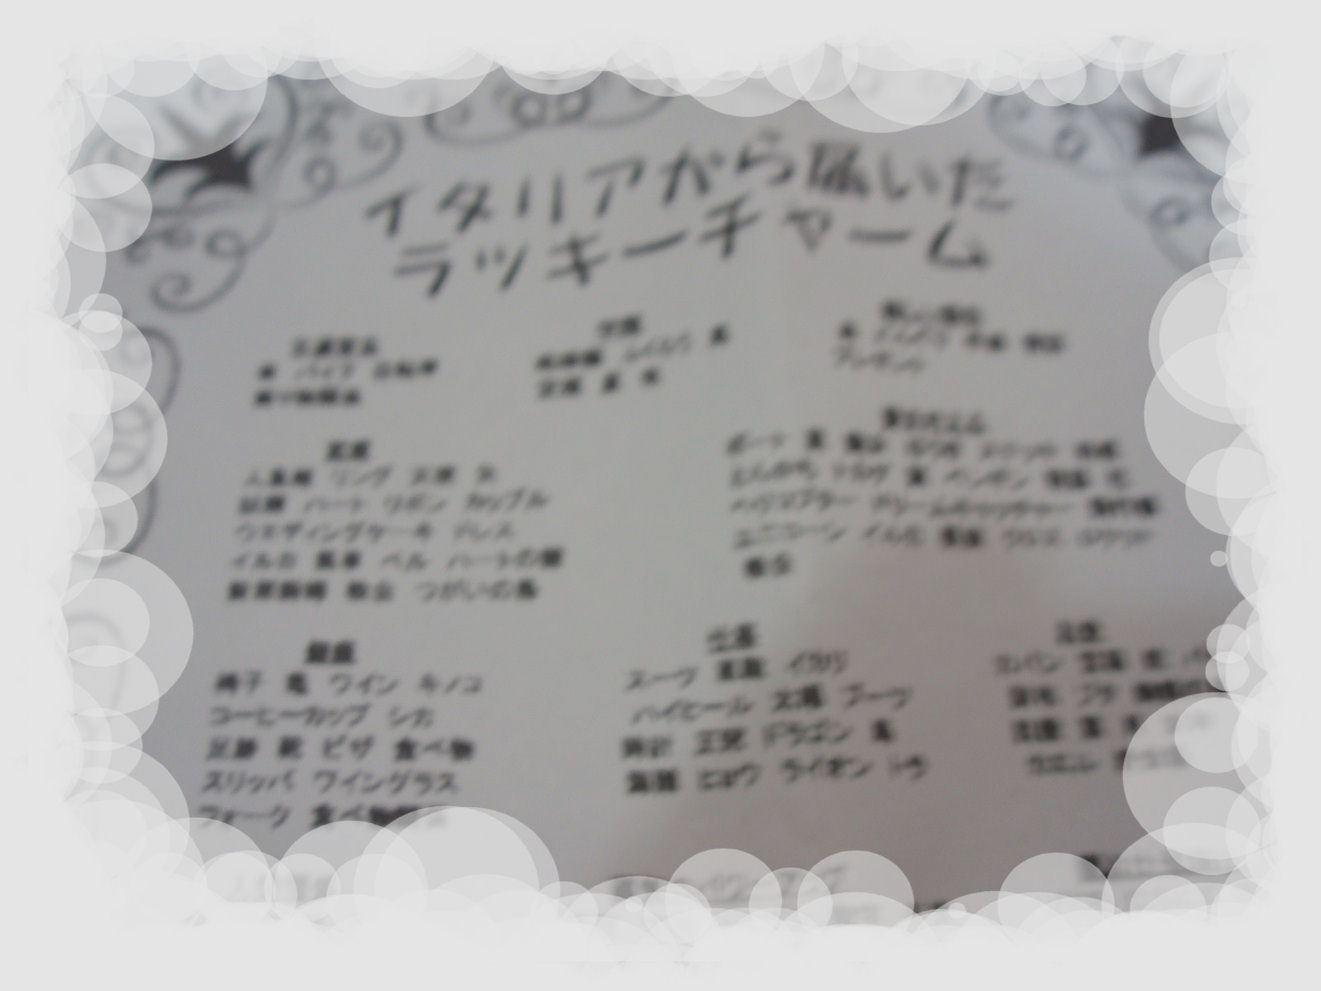 c0098304_2243762.jpg